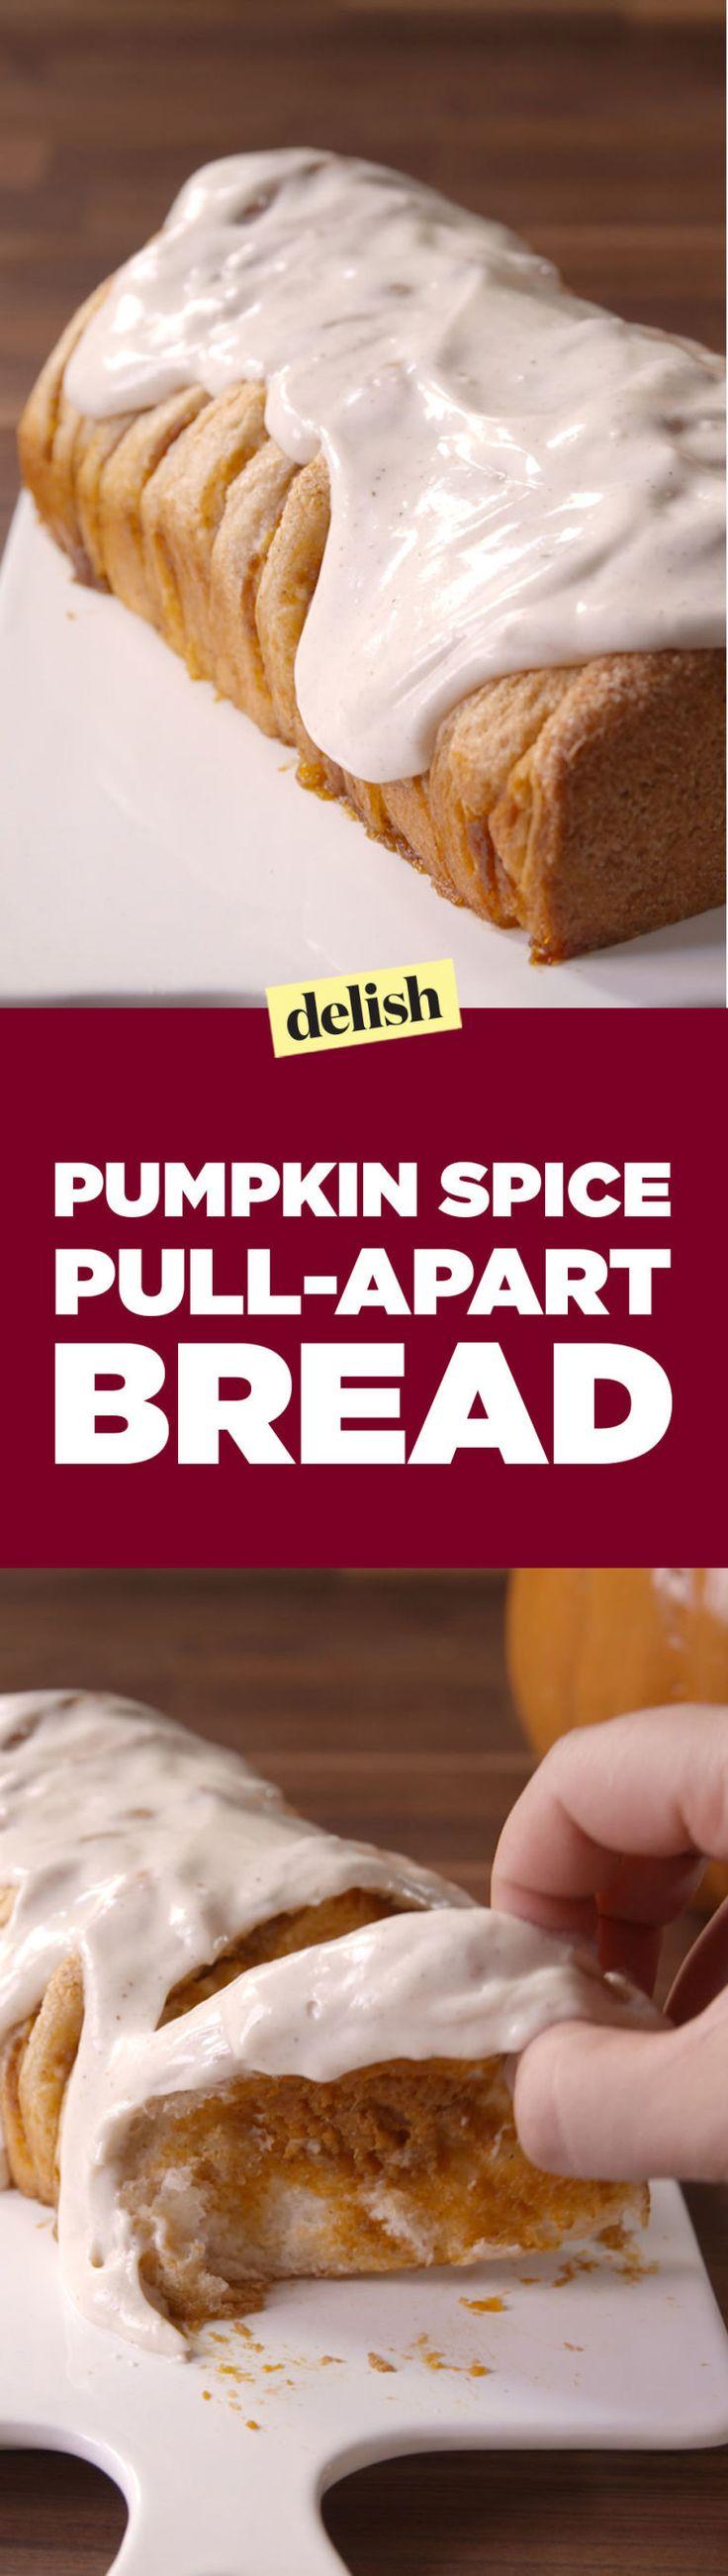 Even Pumpkin Haters Can't Resist This Pumpkin Spice Pull-Apart Bread  - Delish.com